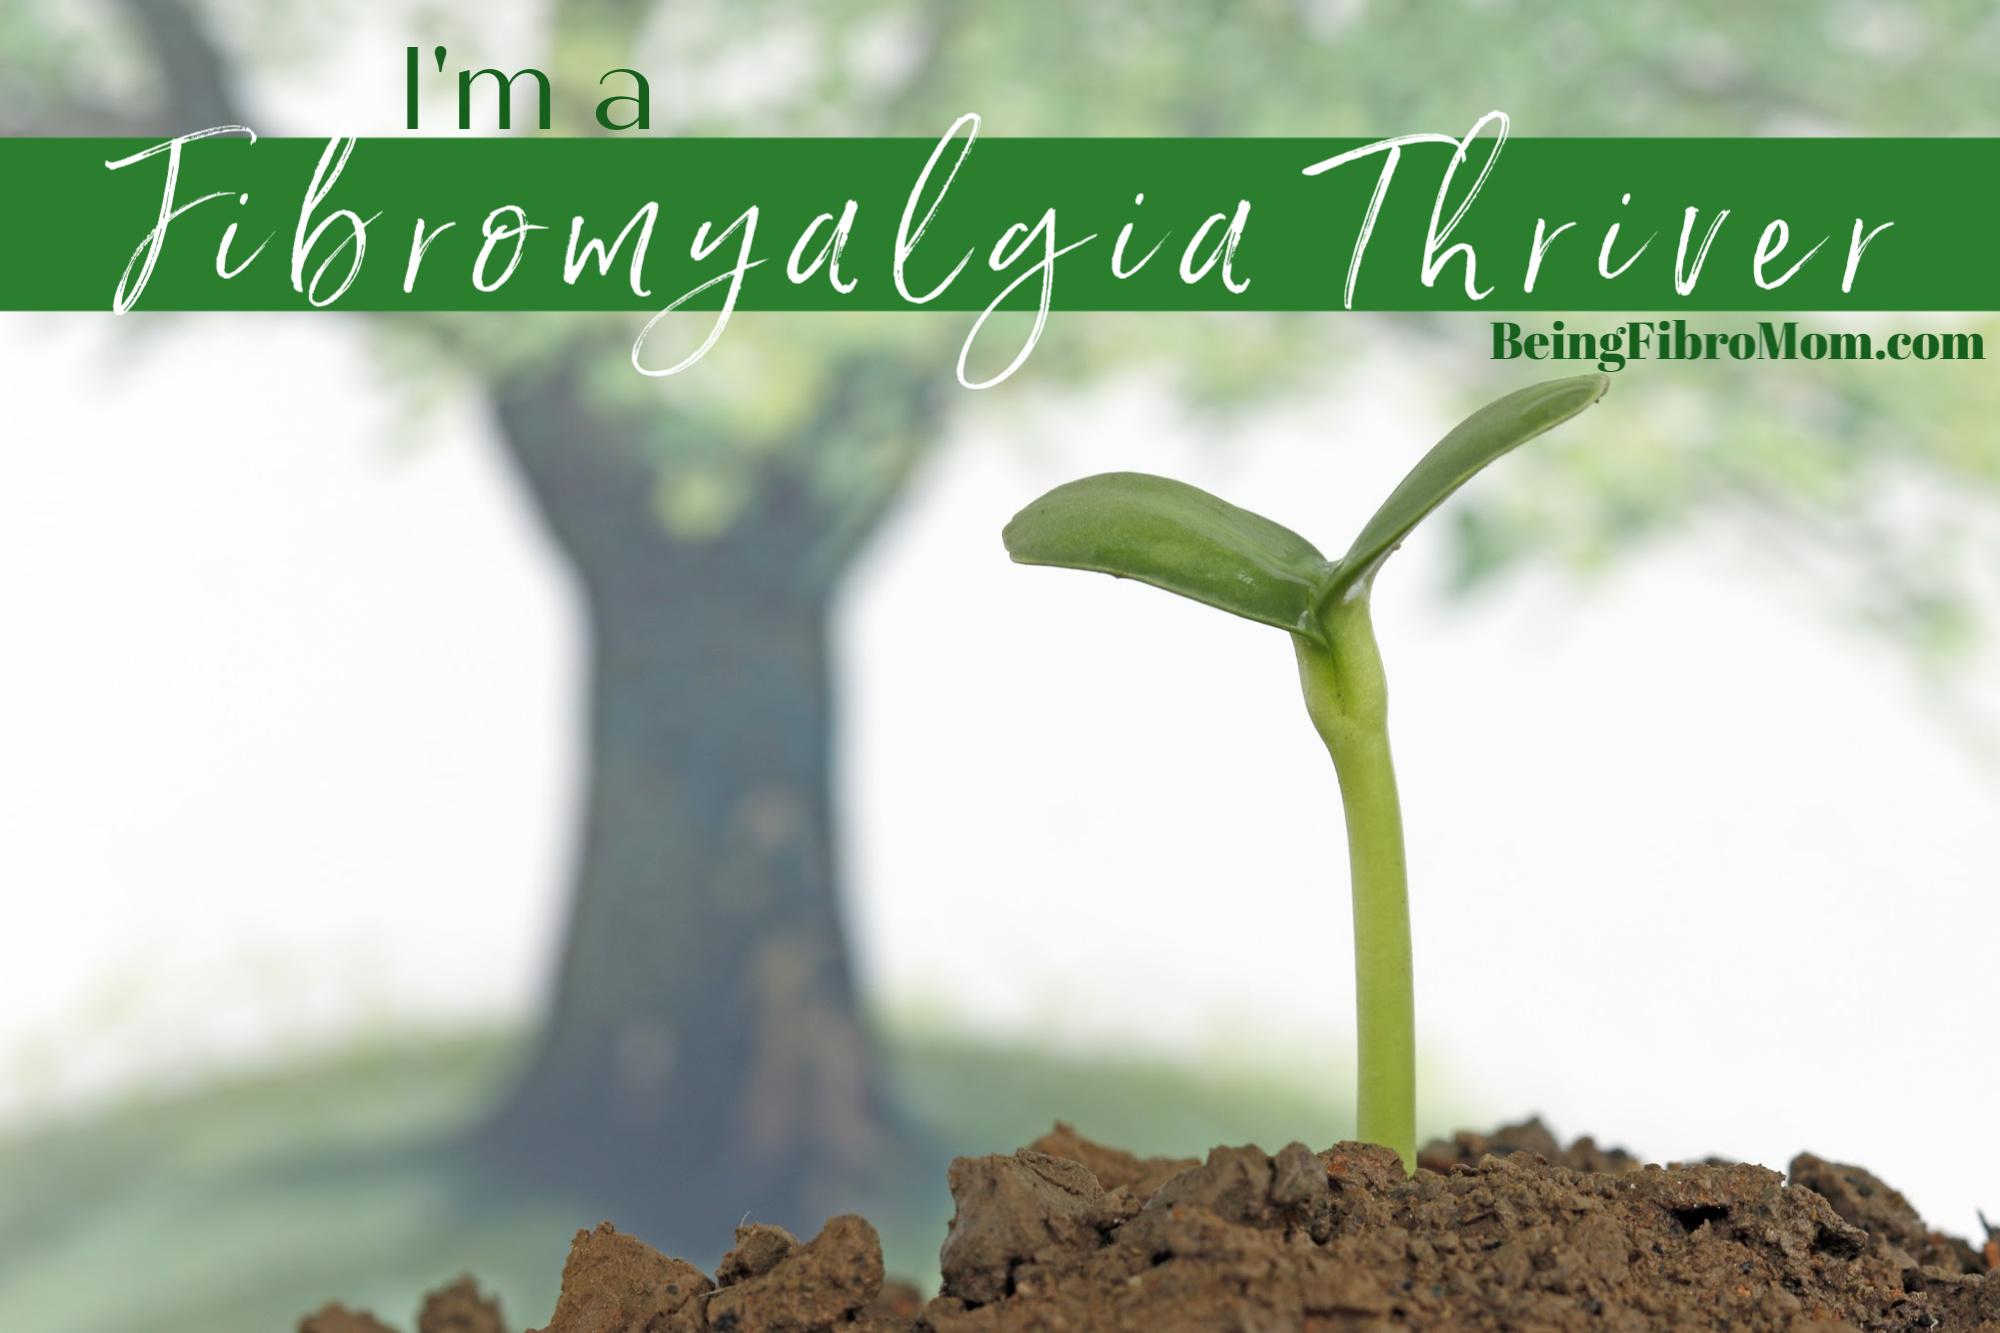 Im a fibromyalgia thriver #fibrothriver #fibroparenting #beingfibromom #fibromyalgia